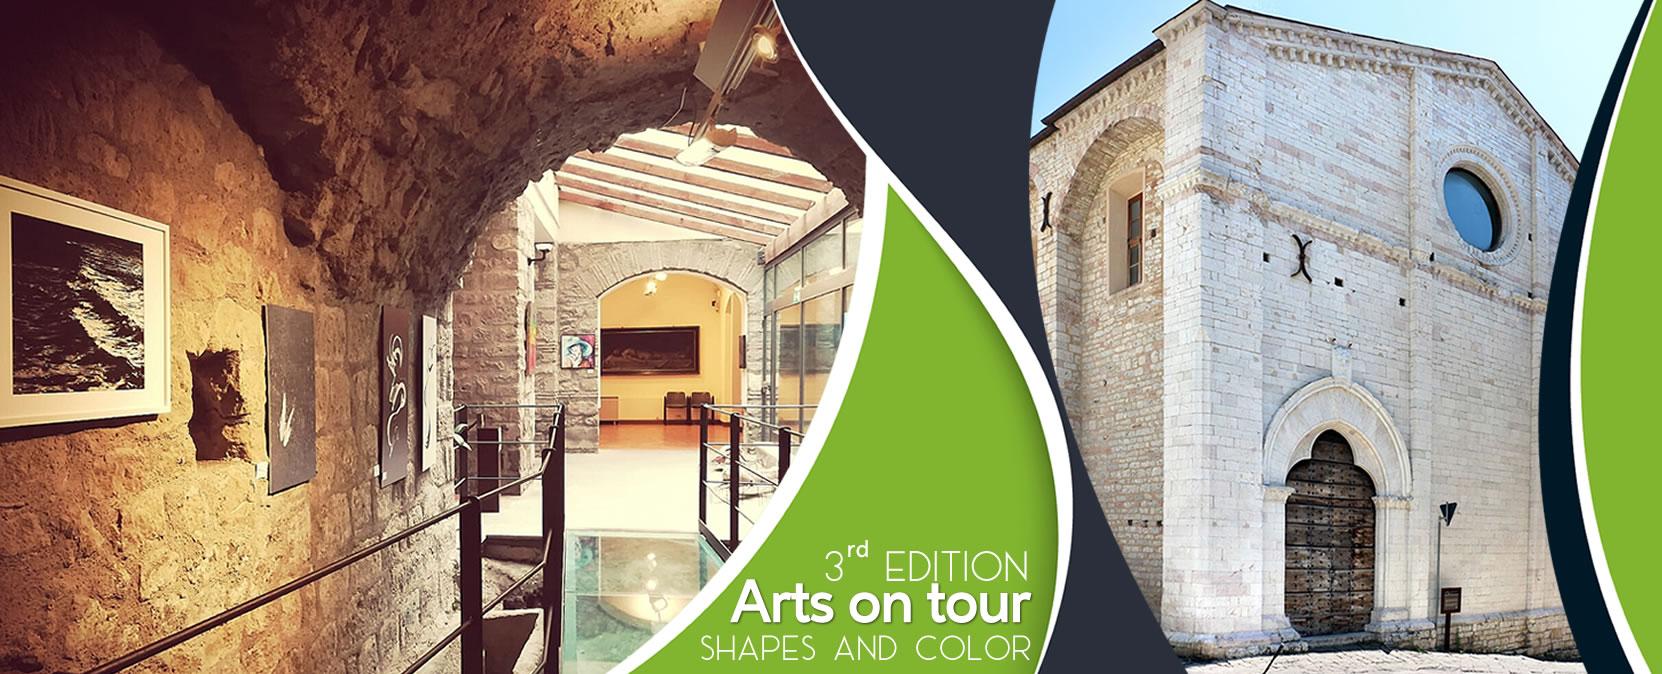 Arts on tour (English version)